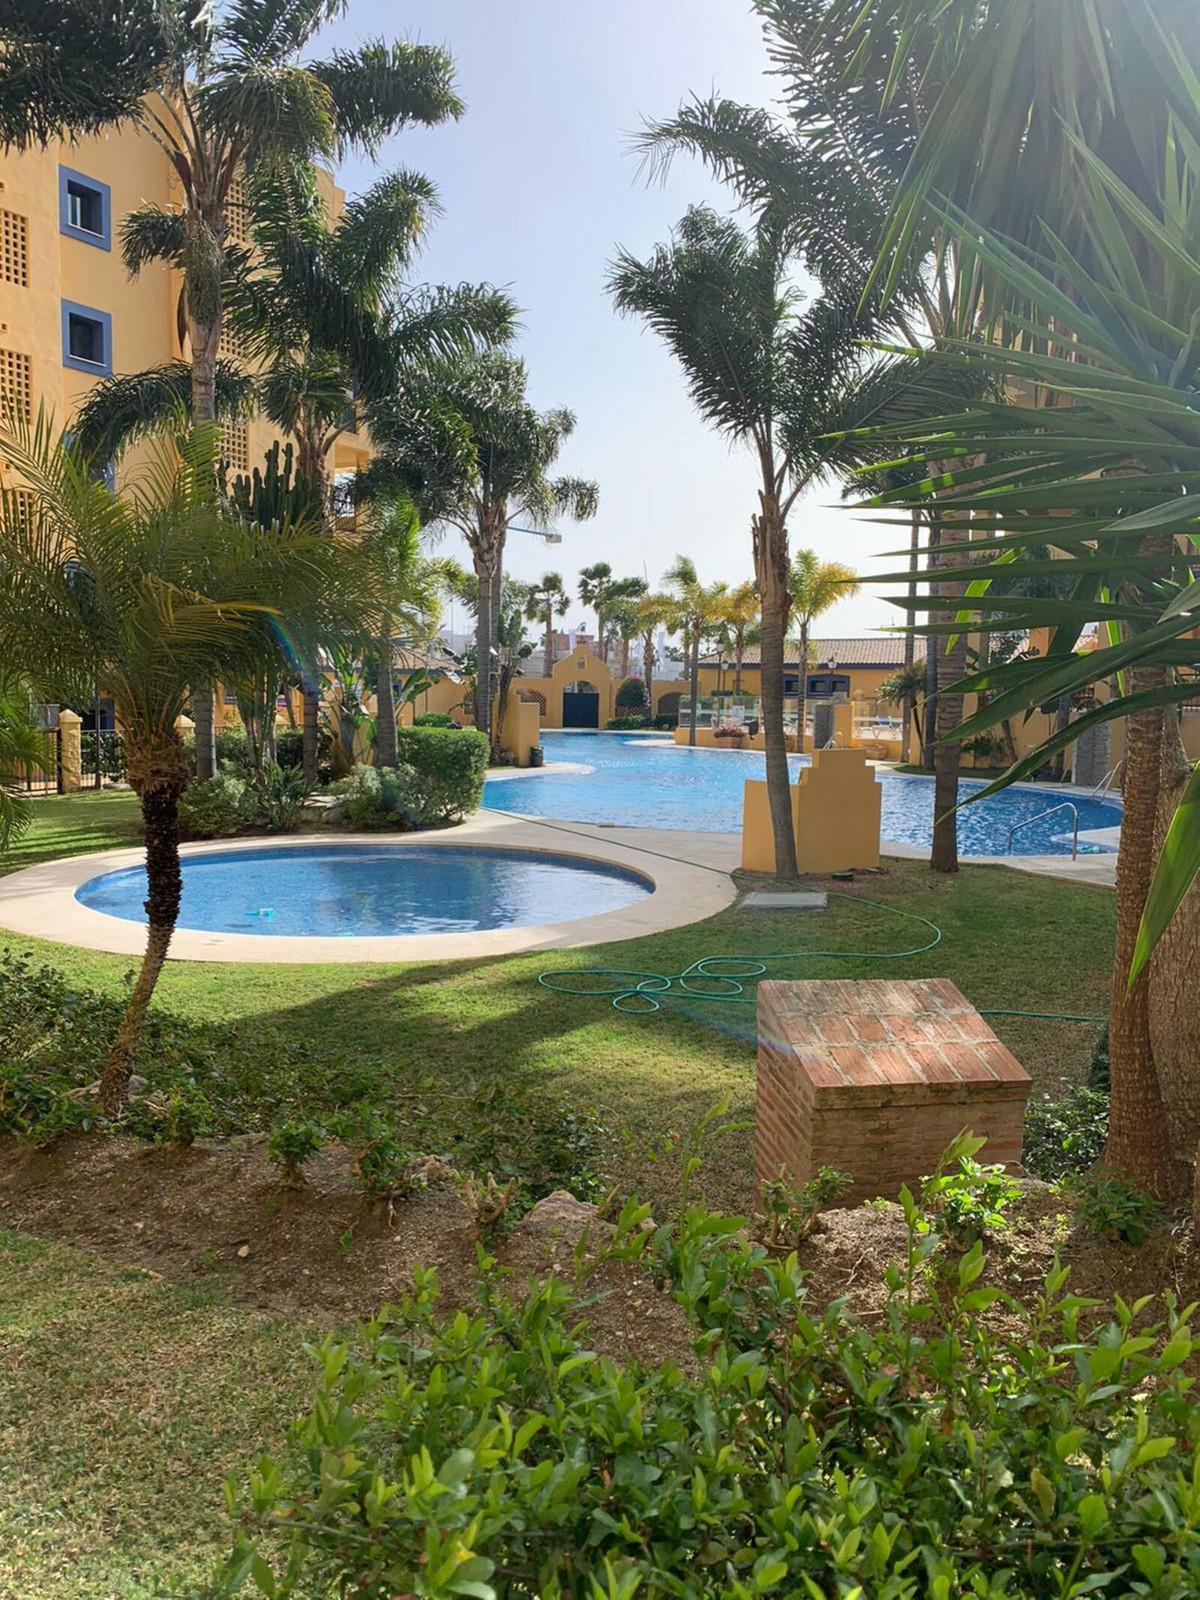 - NEXT TO THE BEACH - SAN PEDRO DE ALCANTARA -  3 bedroom apartment located 600 mts. (2min) from the,Spain